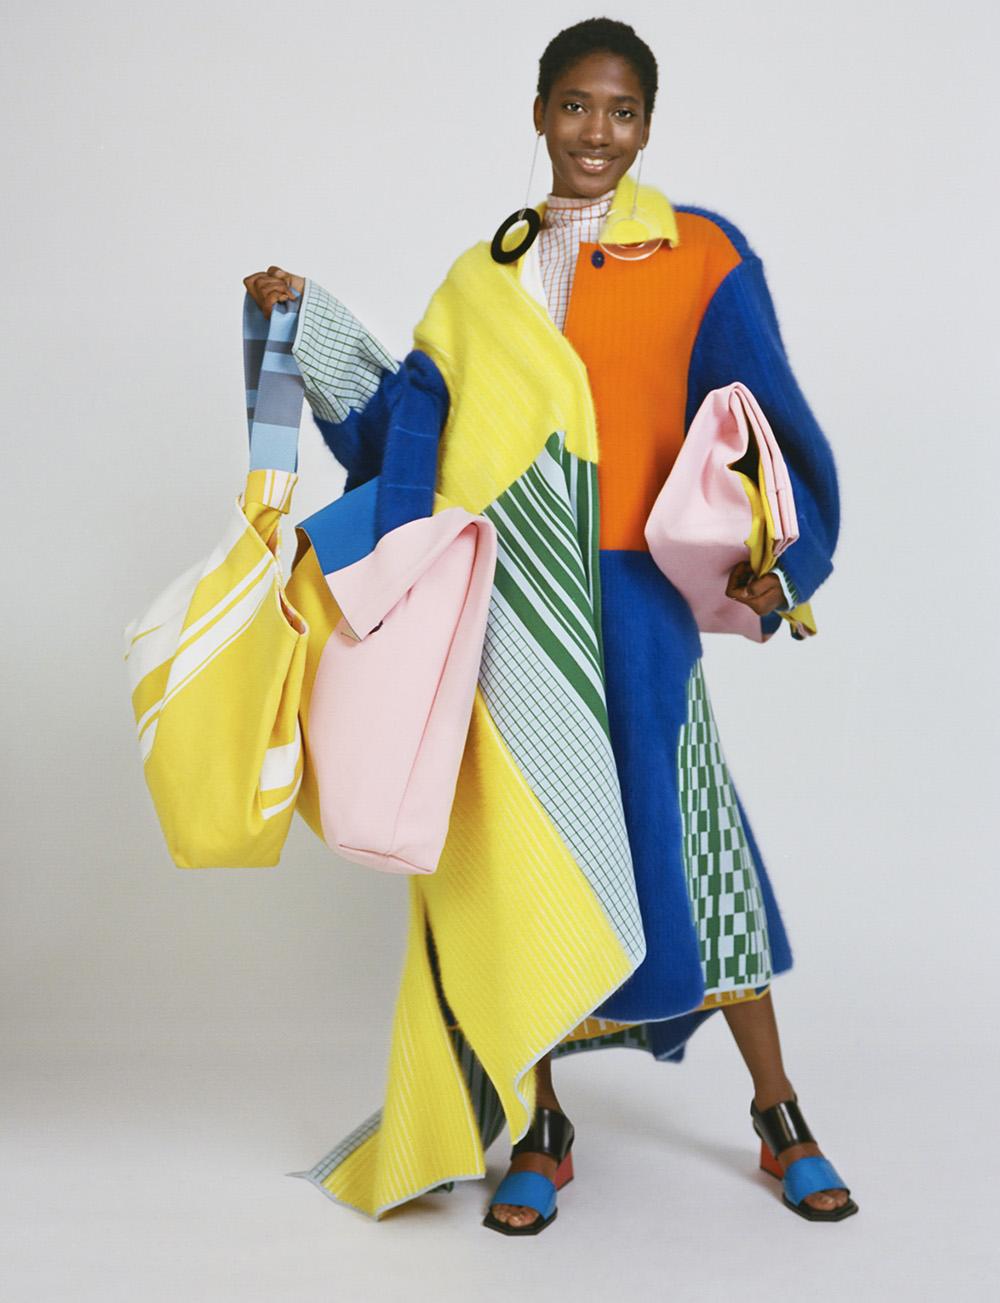 Chen Zhi – MA Fashion Design Technology Womenswear, 2017; Photography by Felix Cooper, styling by Anders Sølvsten Thomsen, hair Roxy Attard, make-up artist Celia Burton; model Yasmina Atta.